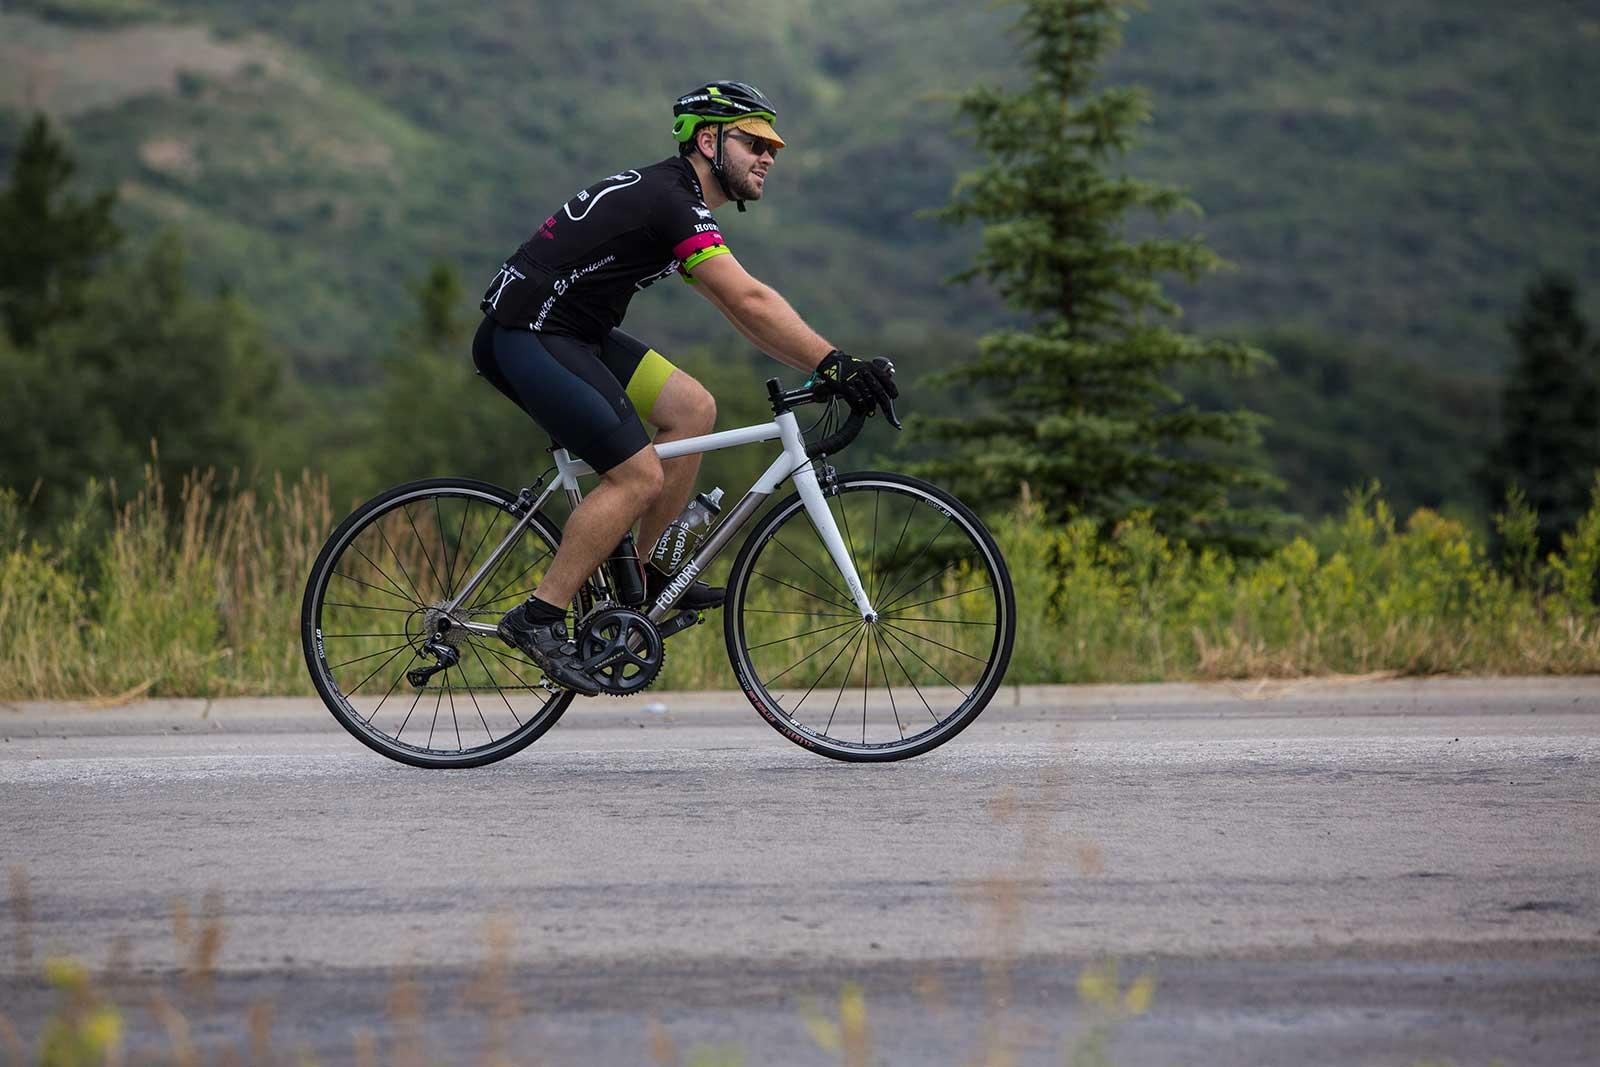 Person riding a Foundry bike at SaddleDrive 2015